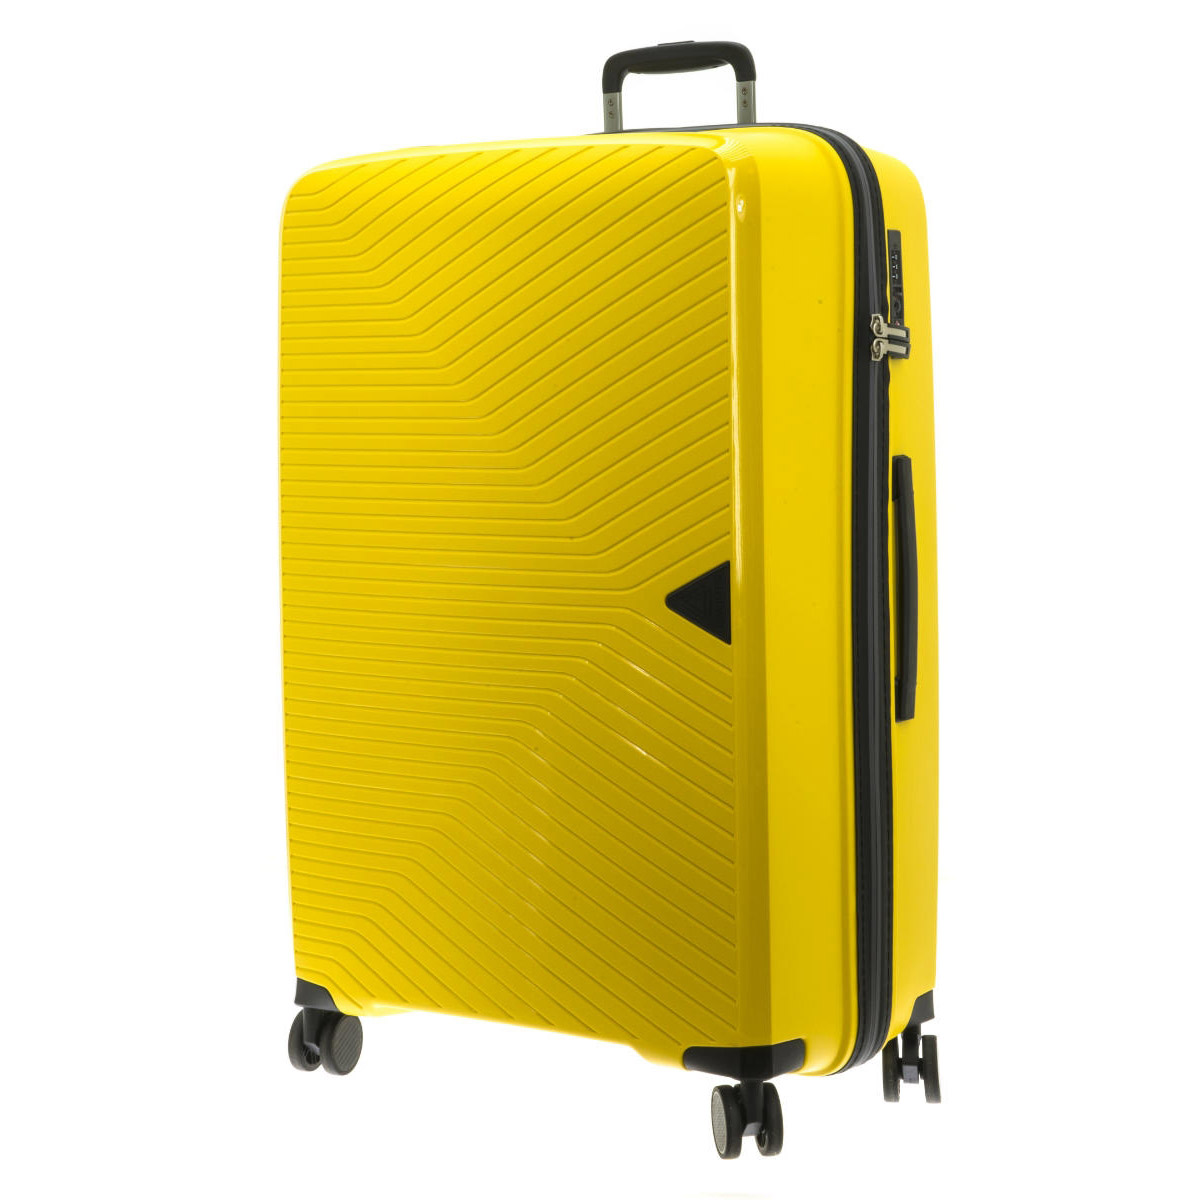 Valise trolley coque polypropylène \'Davidt\'s\' jaune - 77x53x32 cm - [Q9479]